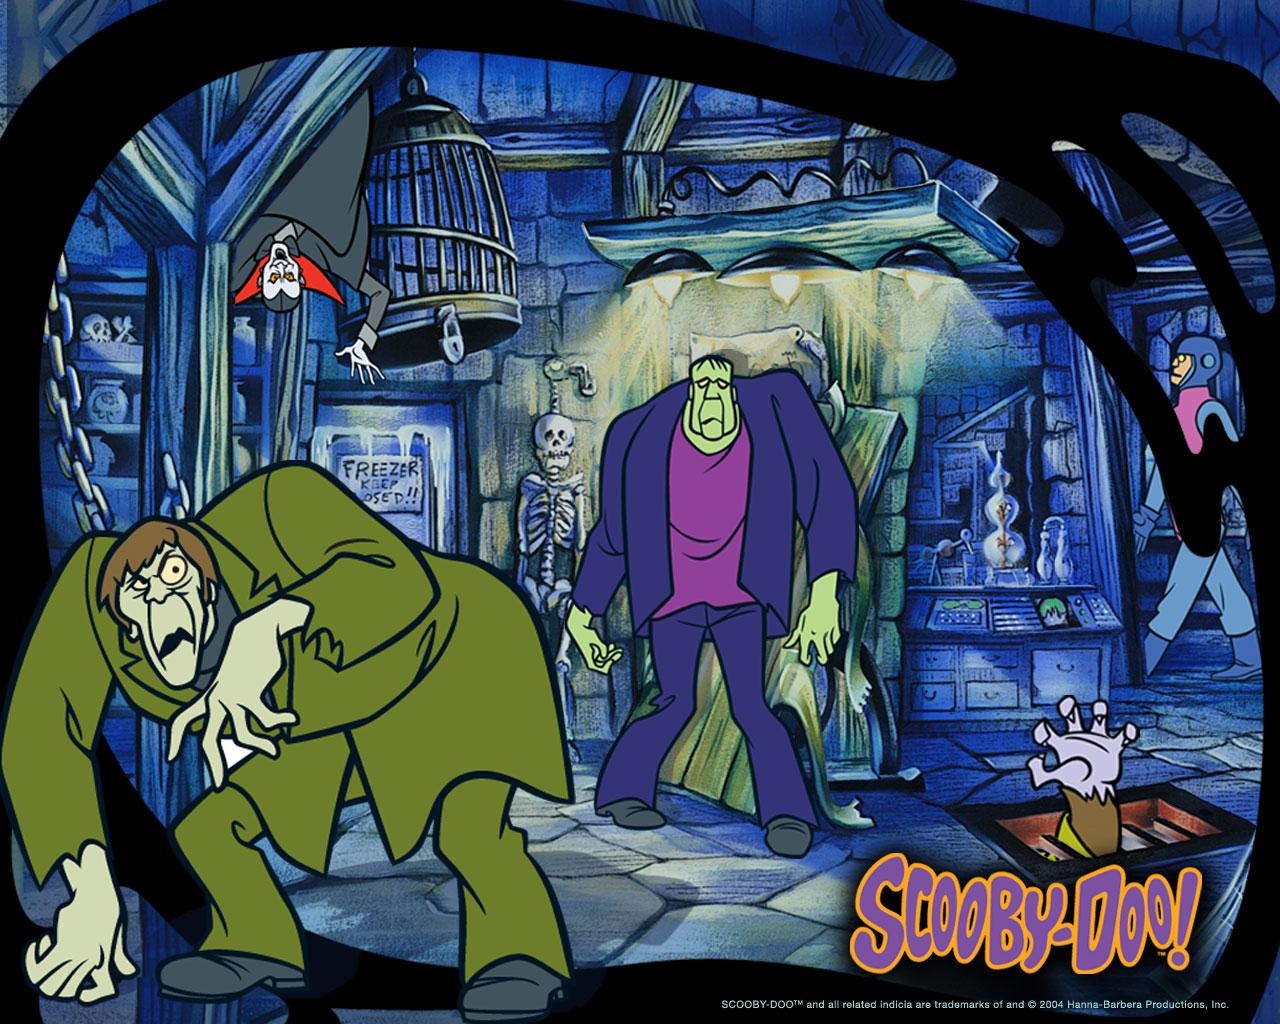 Scooby doo Wallpaper: Scooby Doo wallpaper